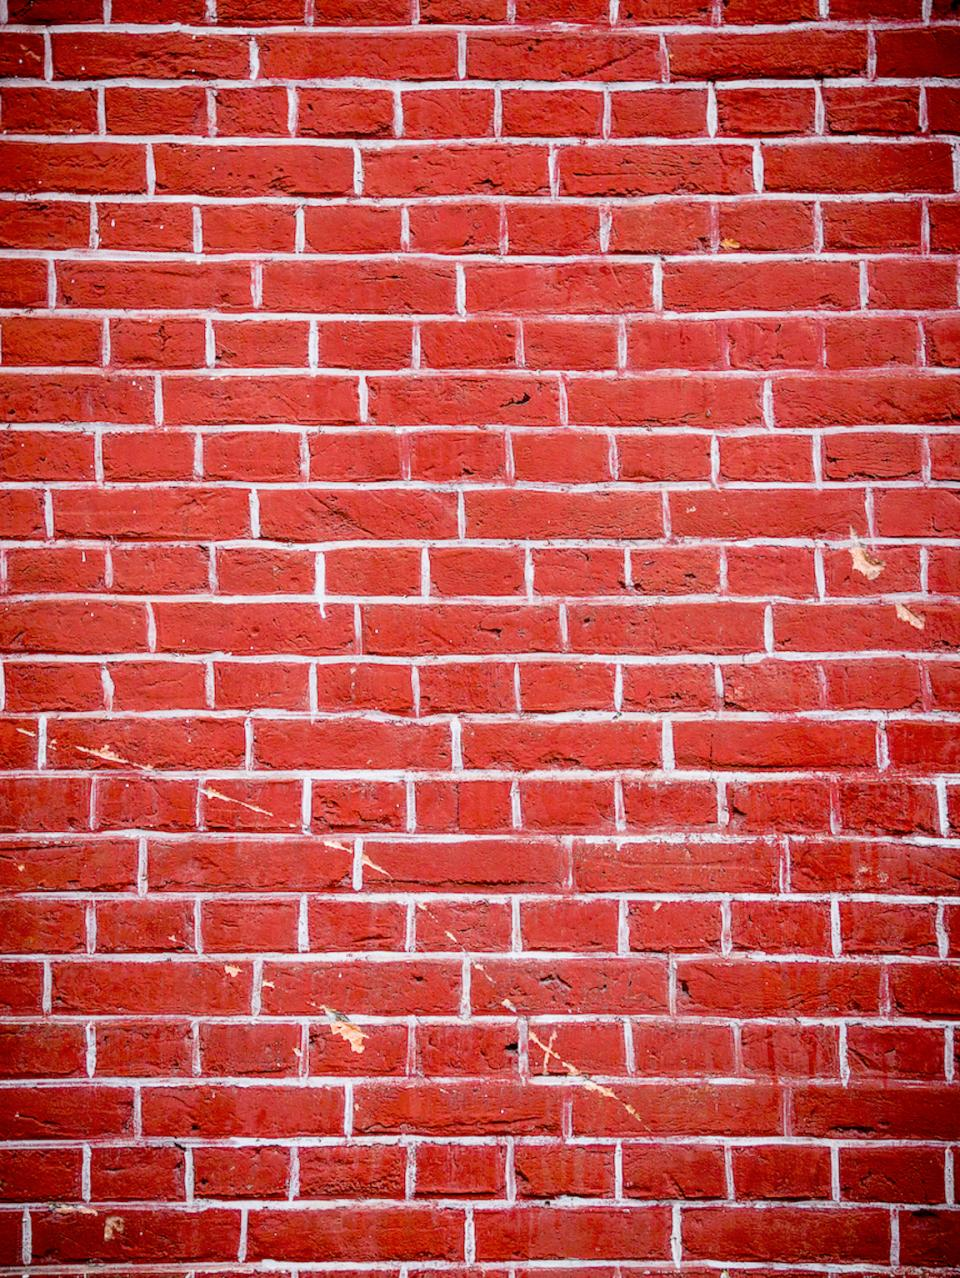 red, wall, bricks, holes, cracks